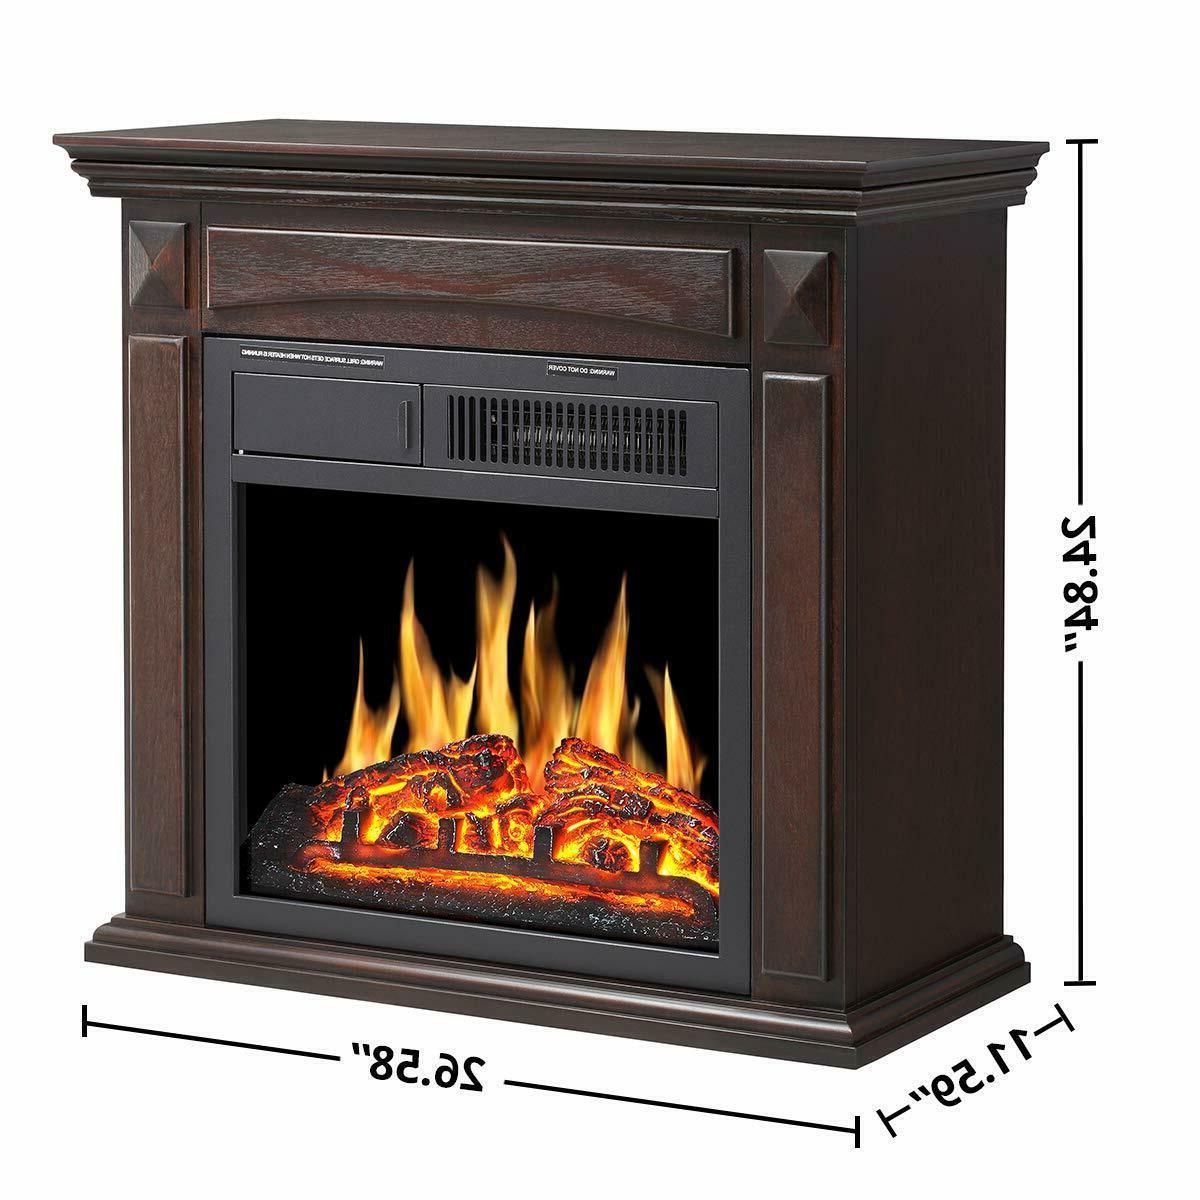 Electric Fireplace Mantel Wooden Surround Firebox,Freestanding deco